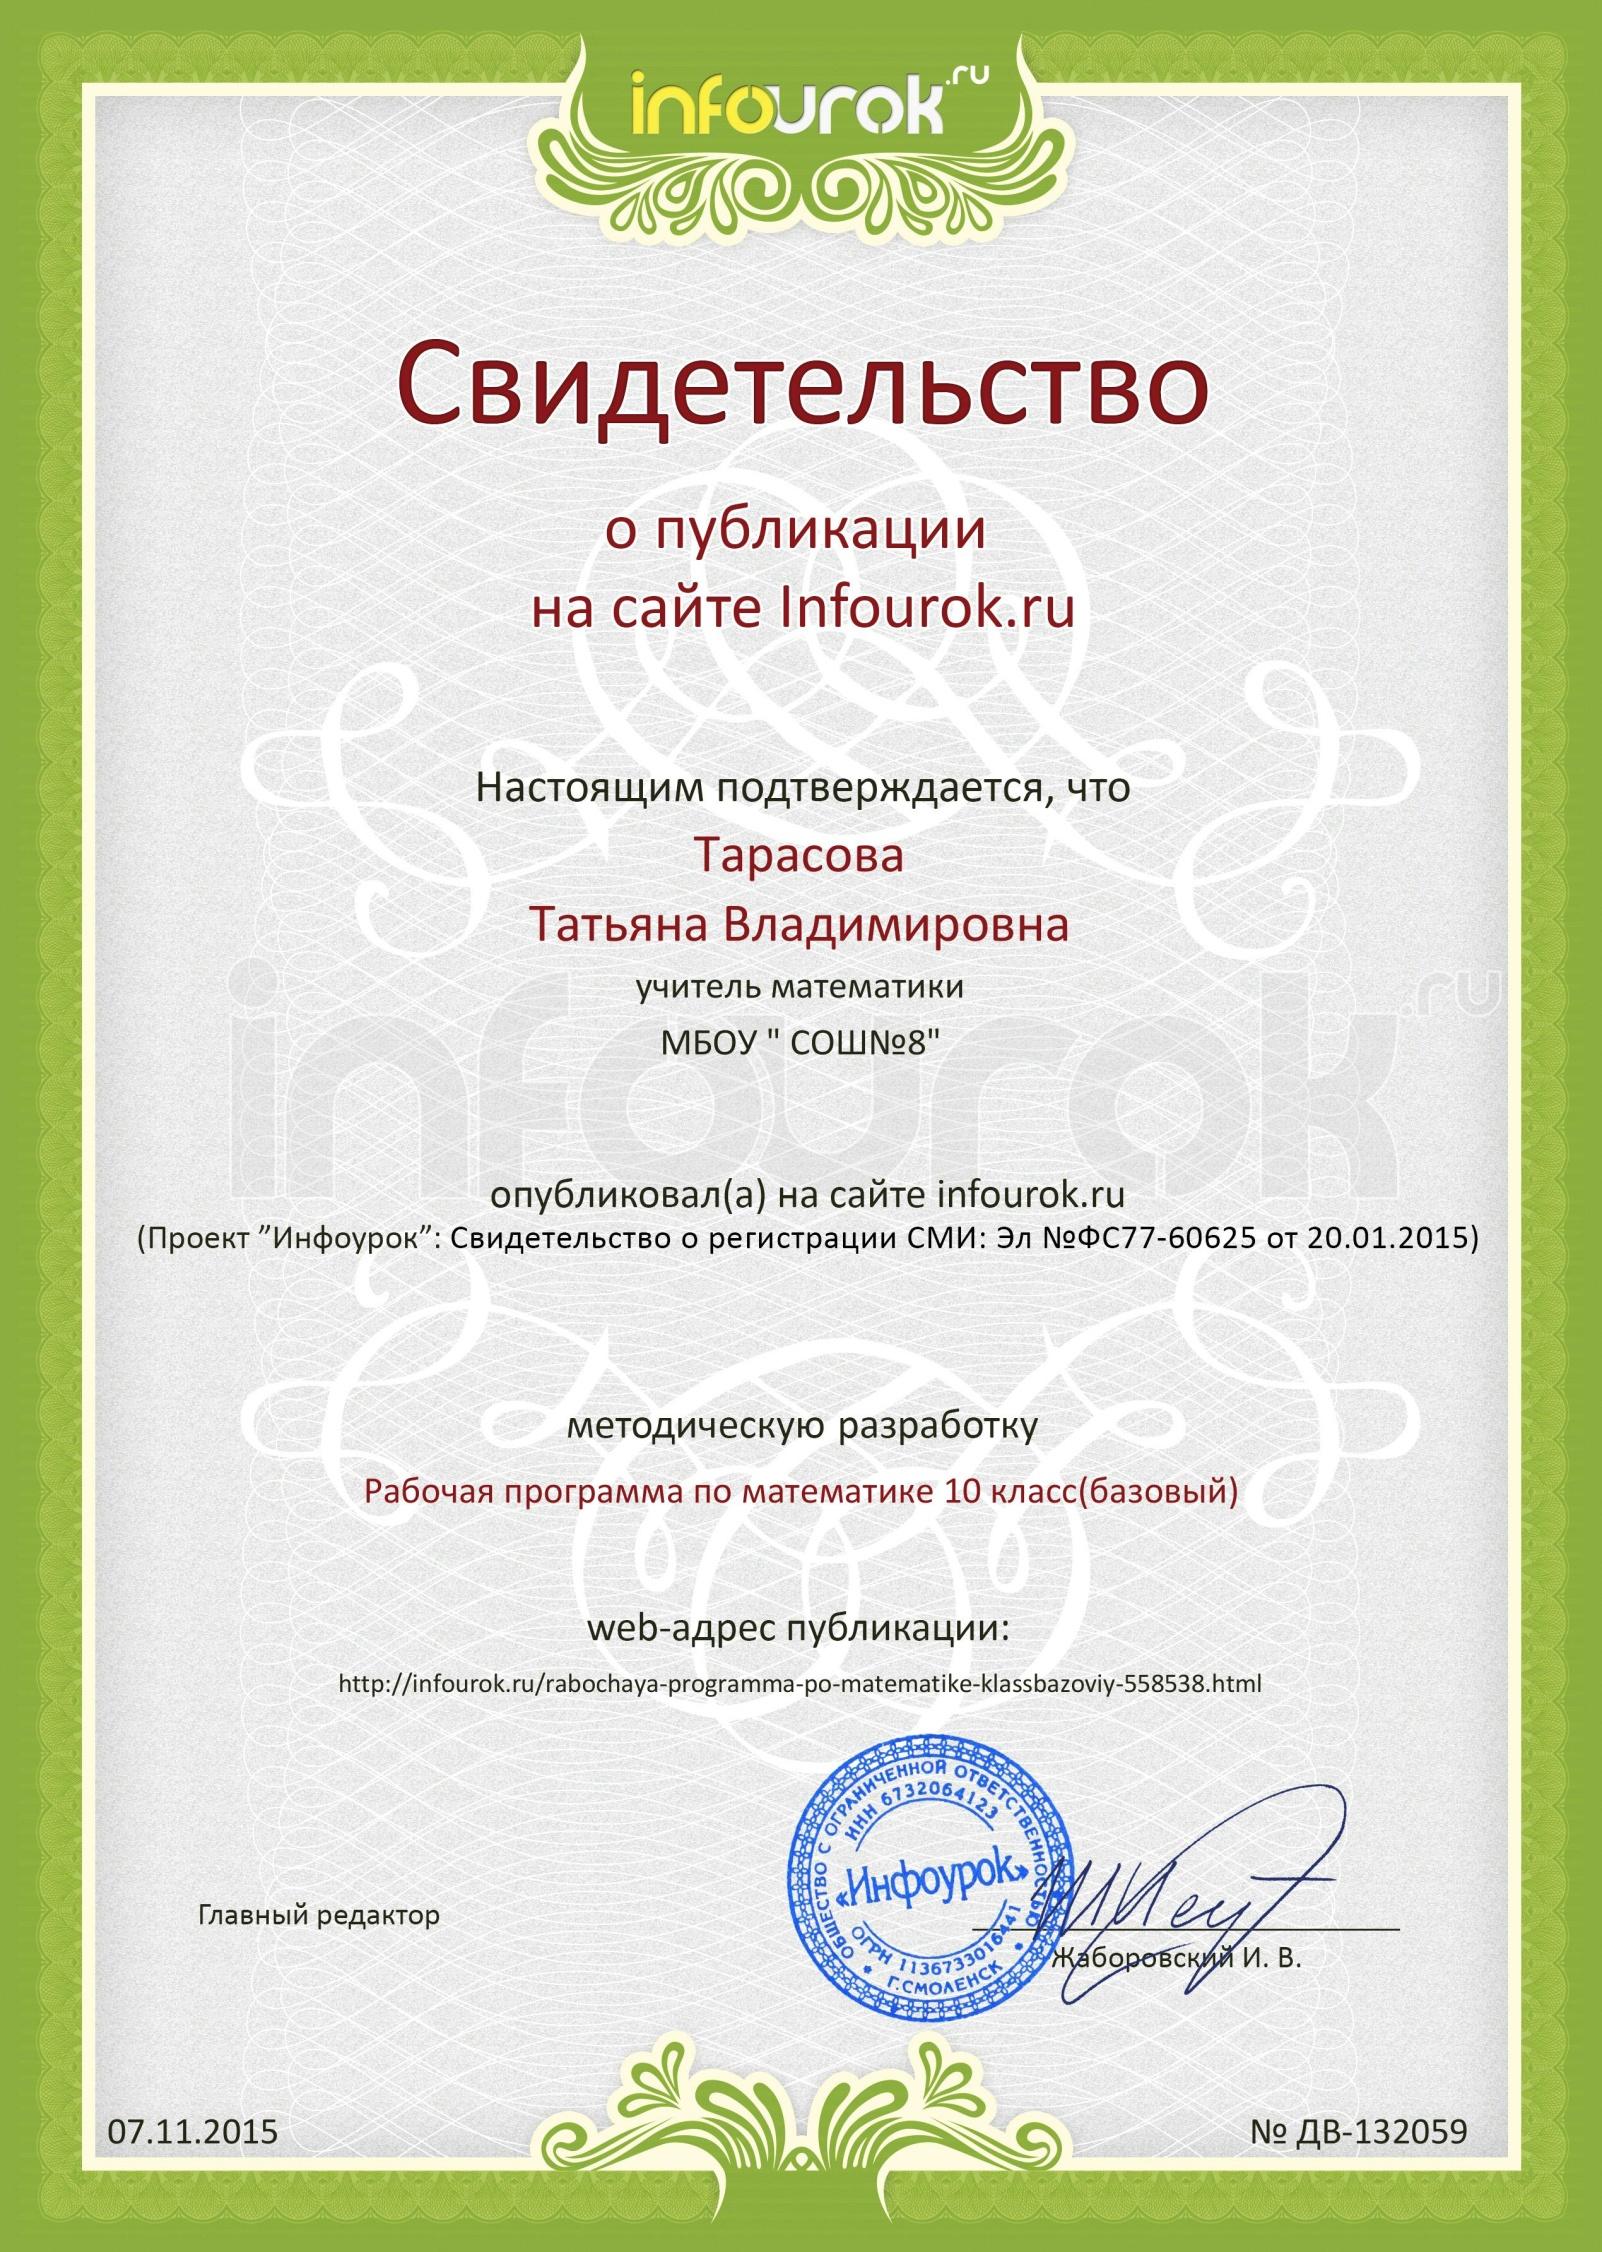 C:\Users\User\Downloads\Сертификат проекта infourok.ru № ДВ-132059.jpg